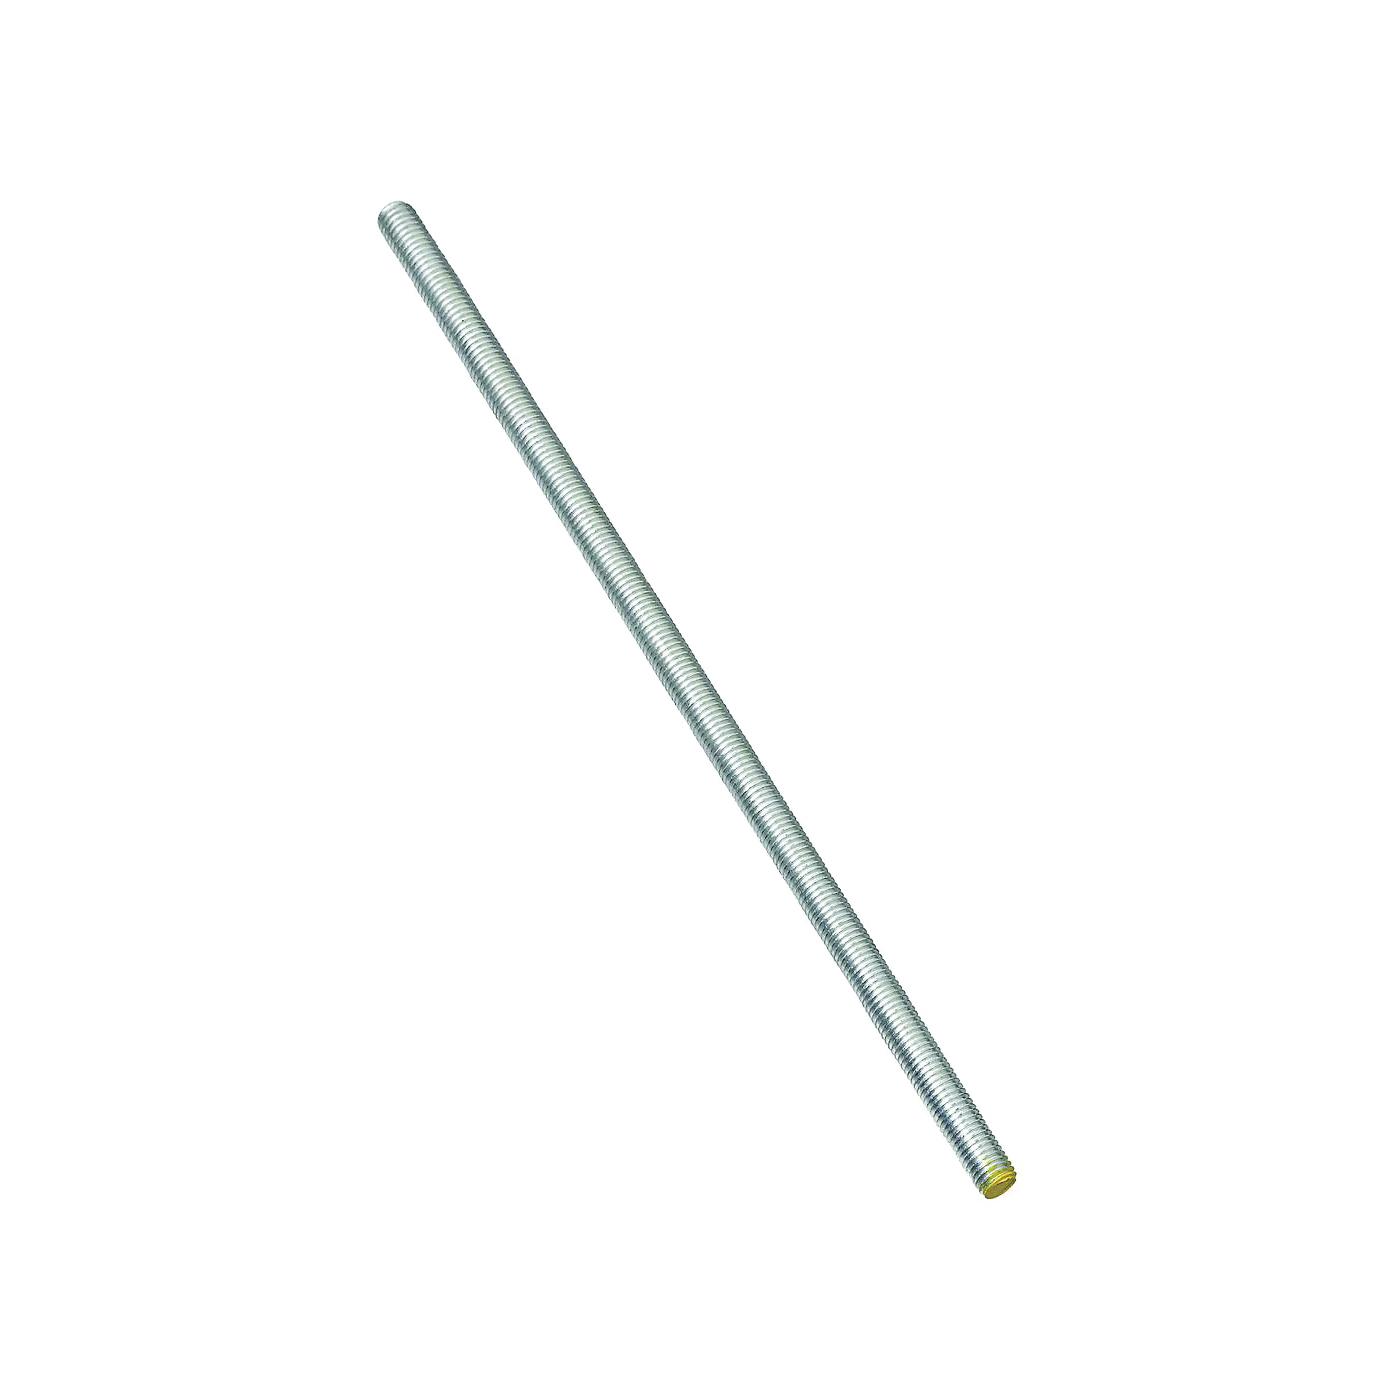 Picture of Stanley Hardware 179333 Threaded Rod, 3/8-16 Thread, 12 in L, A Grade, Steel, Zinc, UNC Thread